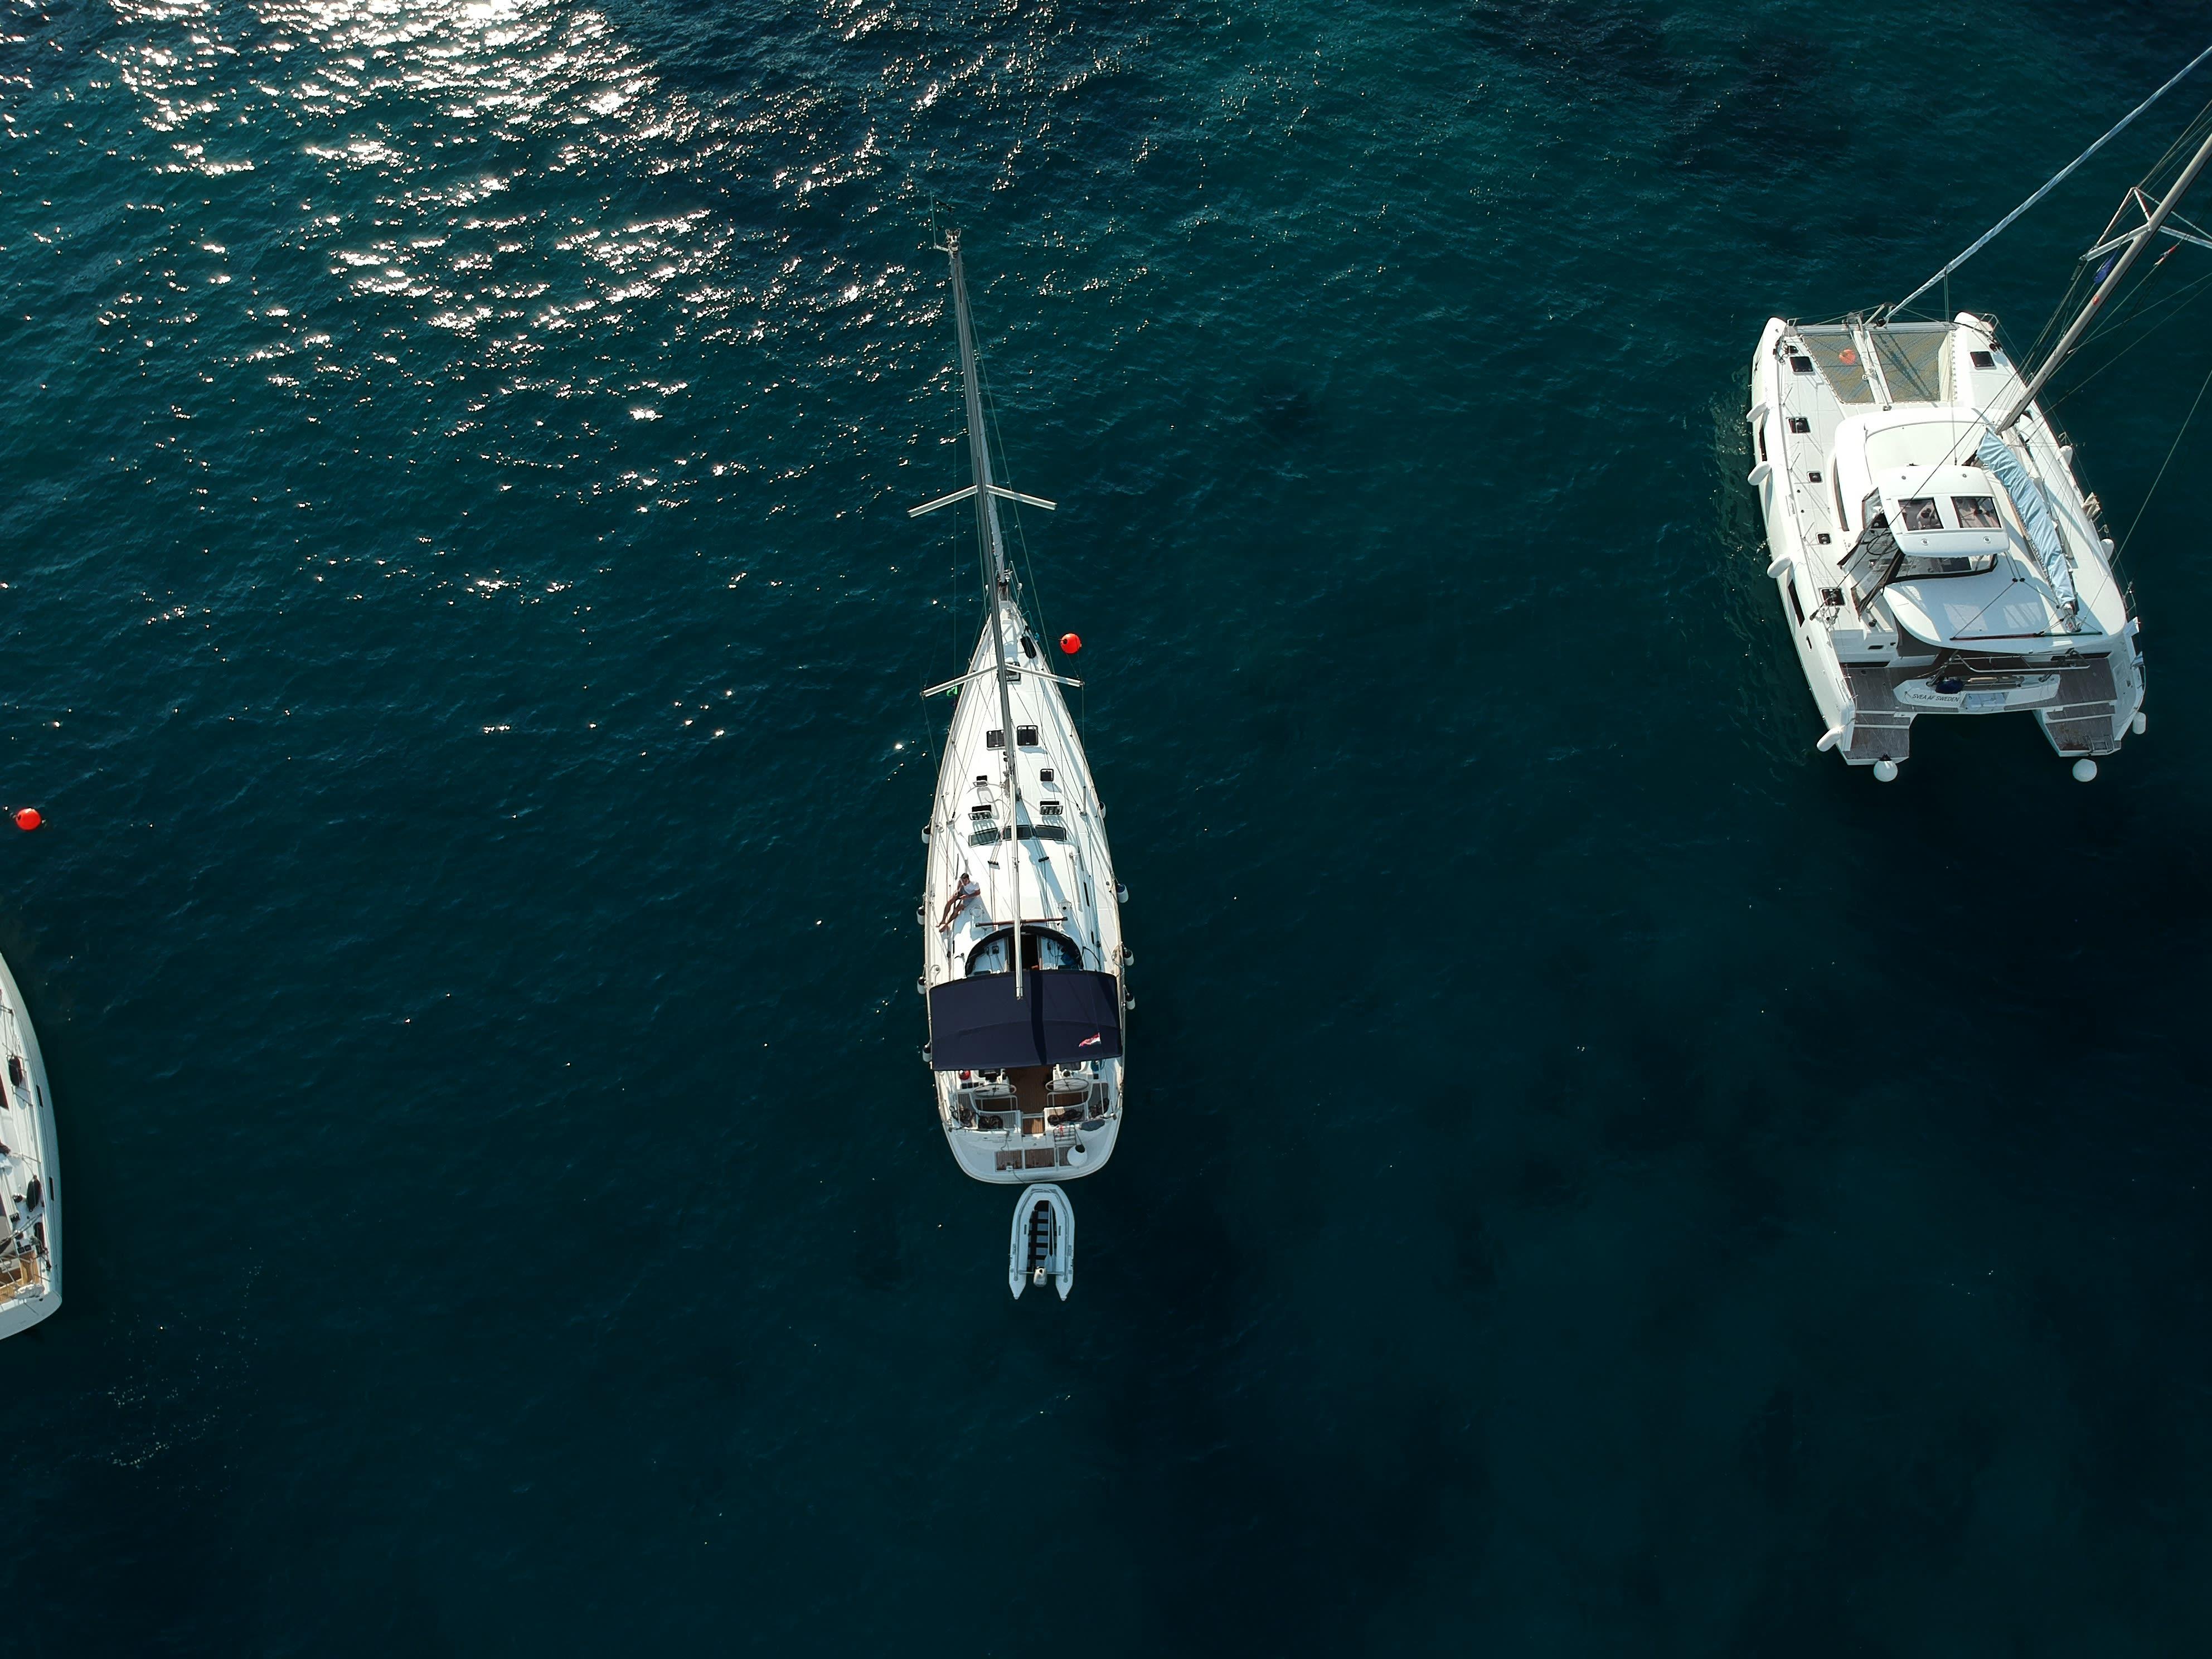 sailingboat and catamaran rented with ZIZOO